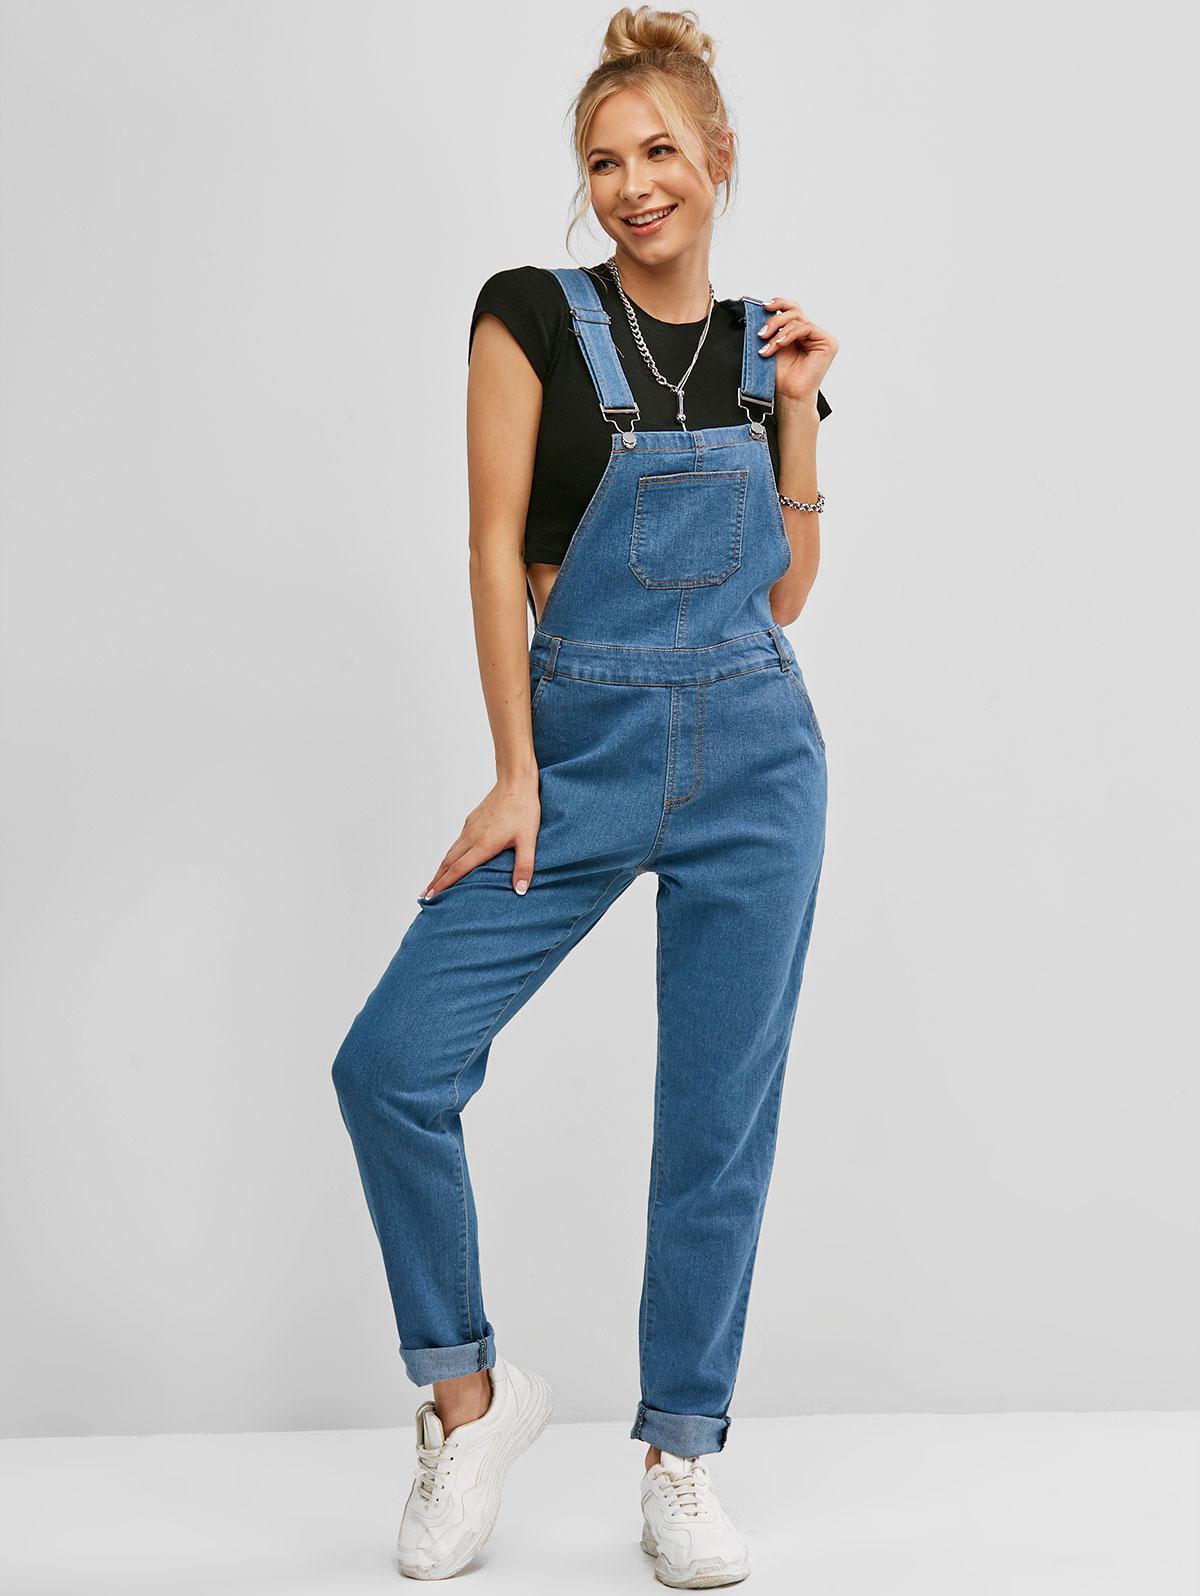 Denim Pockets Overalls Tapered Jumpsuit